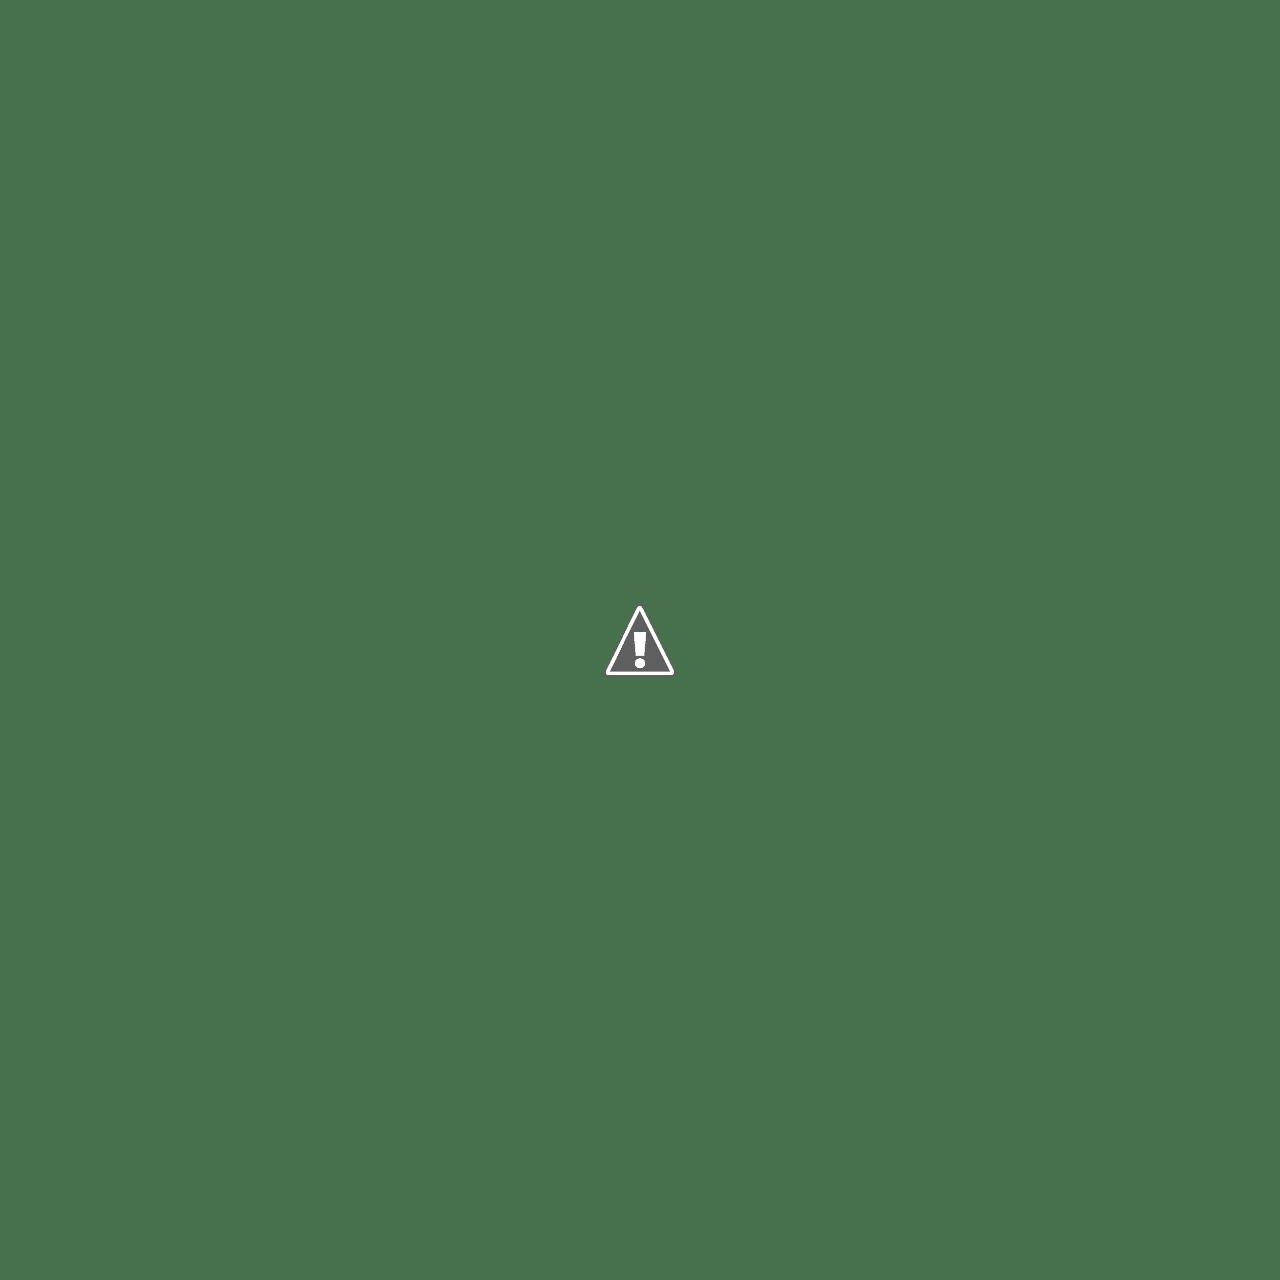 73 Gambar Batik Laut Paling Hist